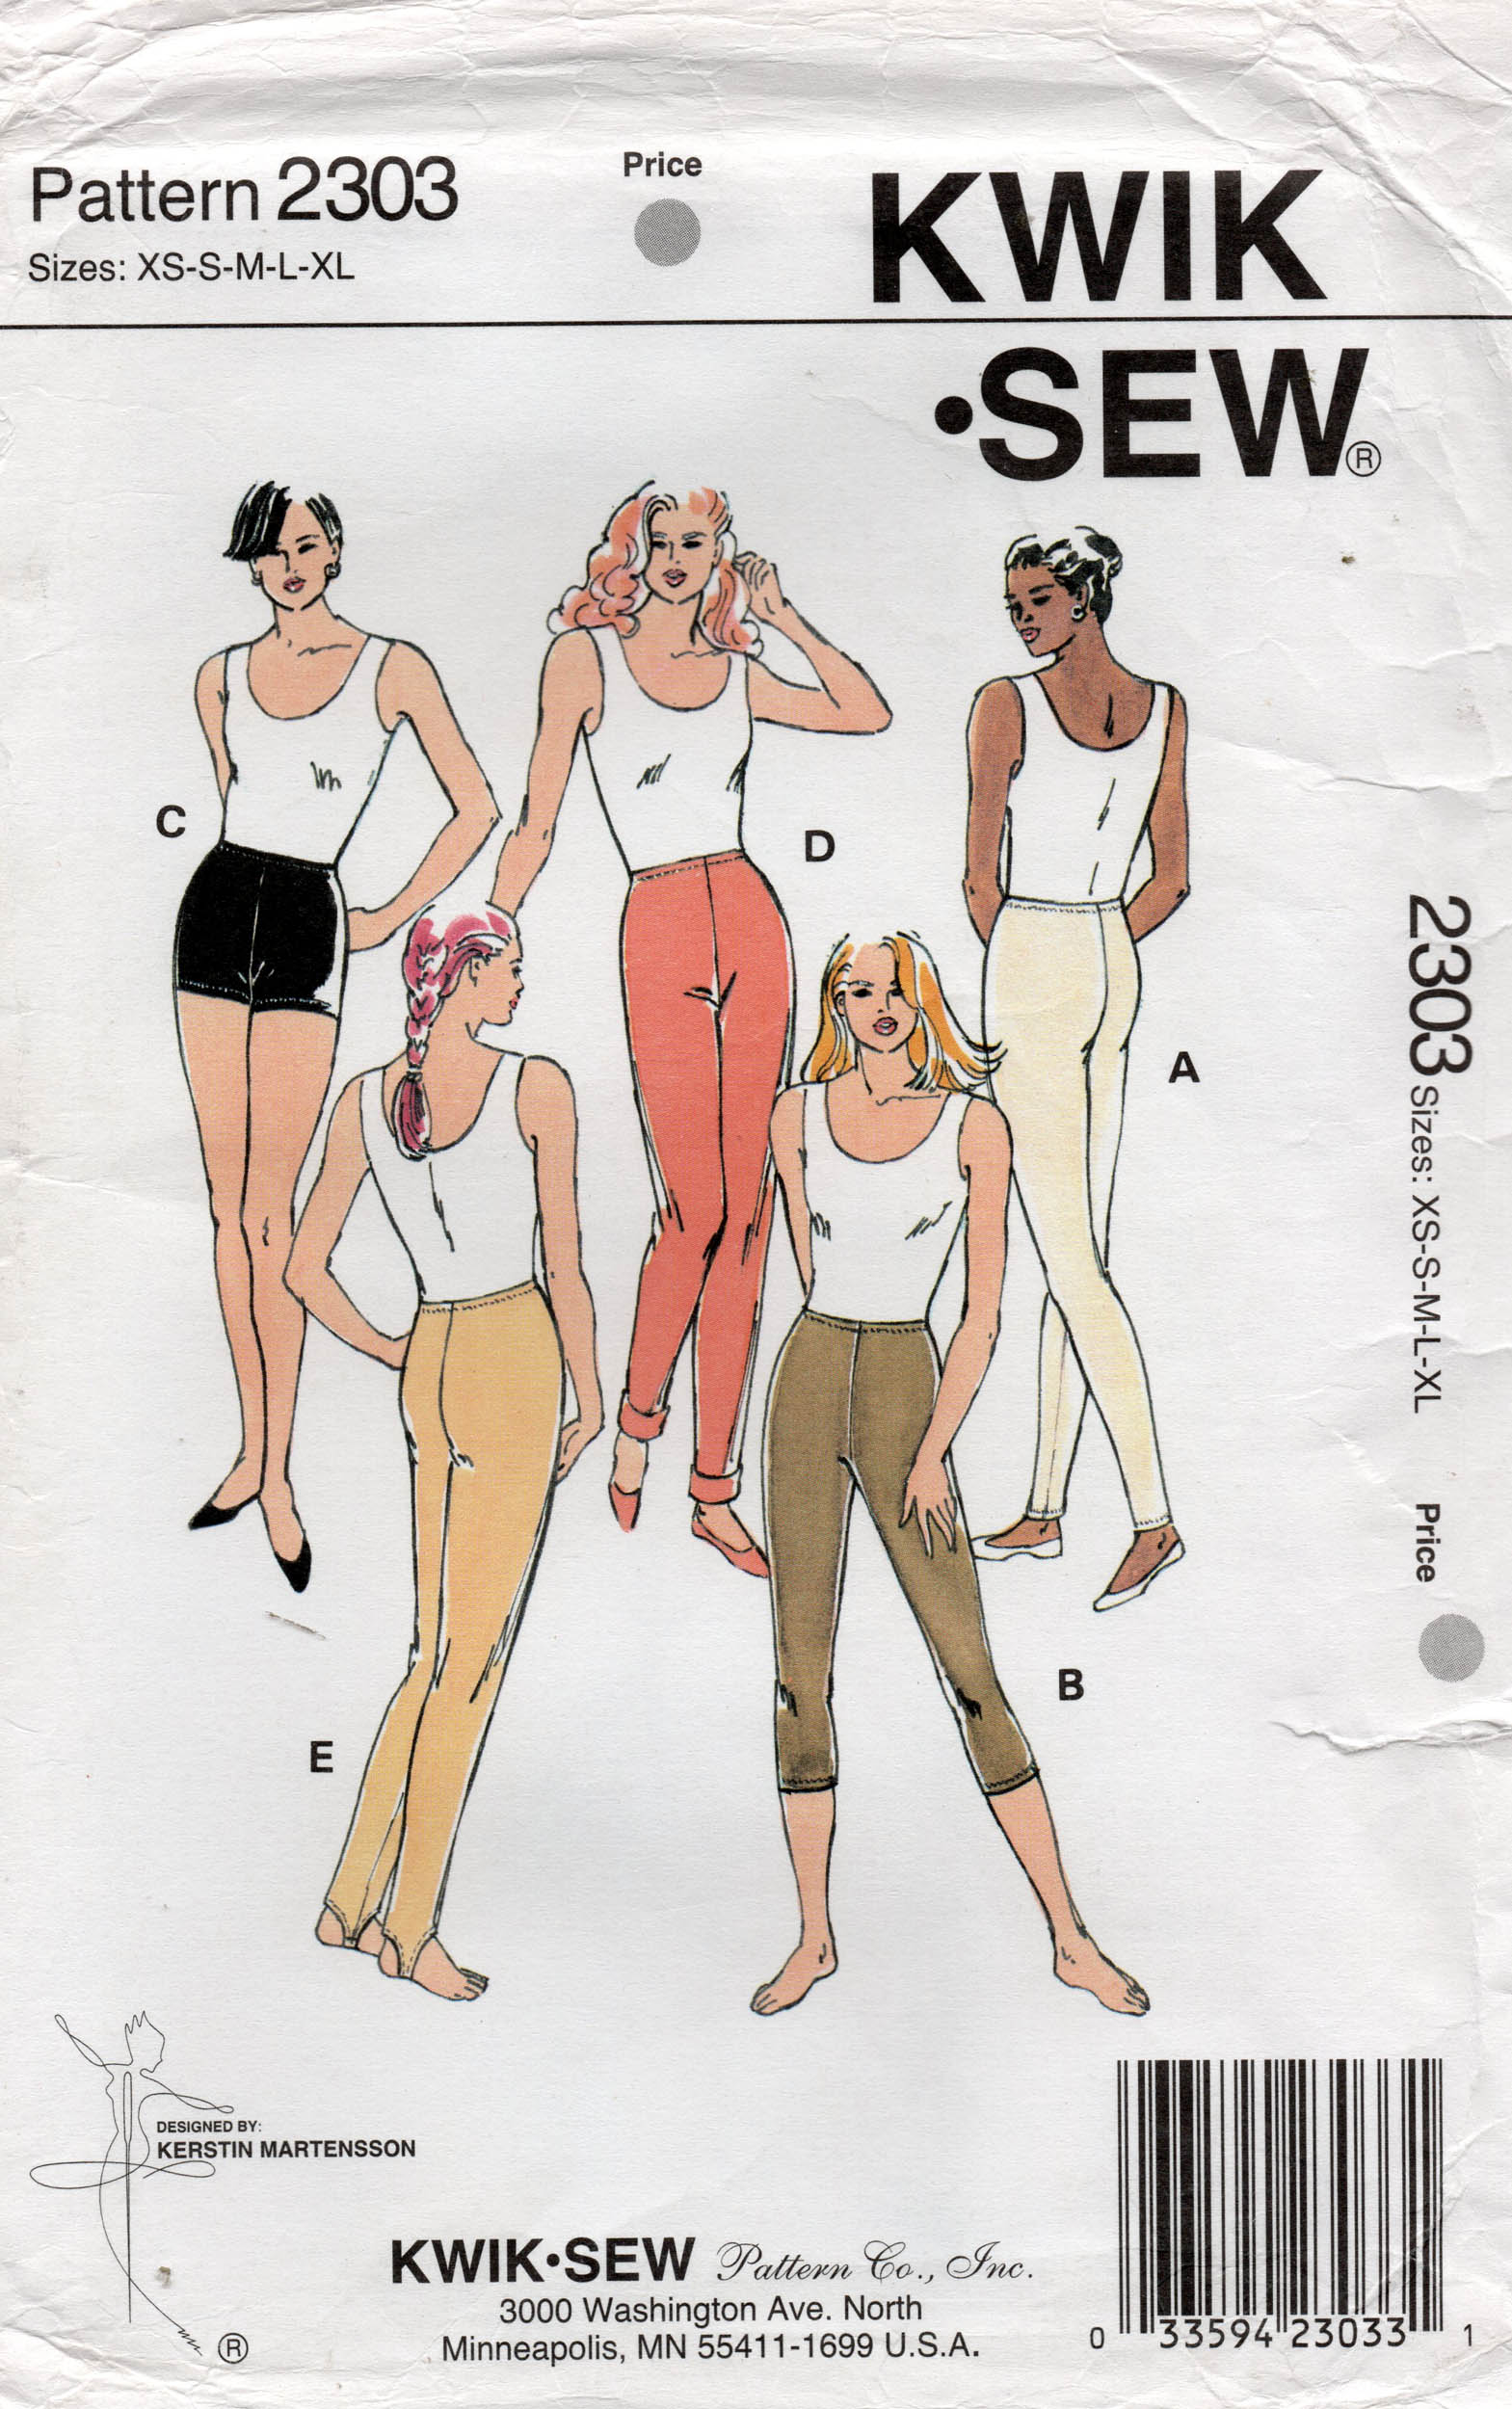 Kwik Sew 2303